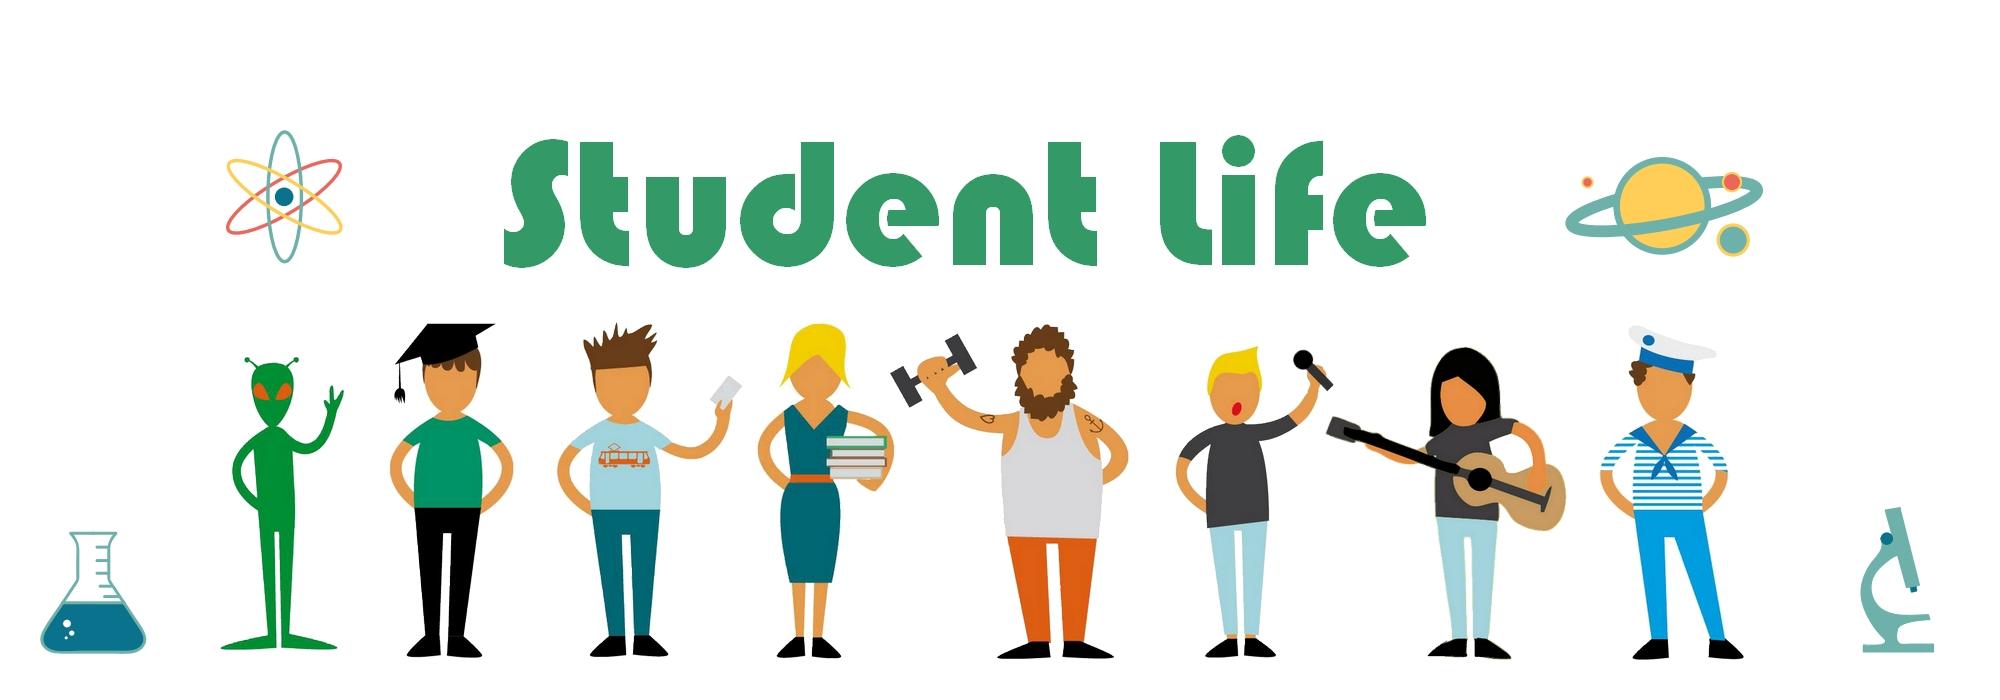 Student life.